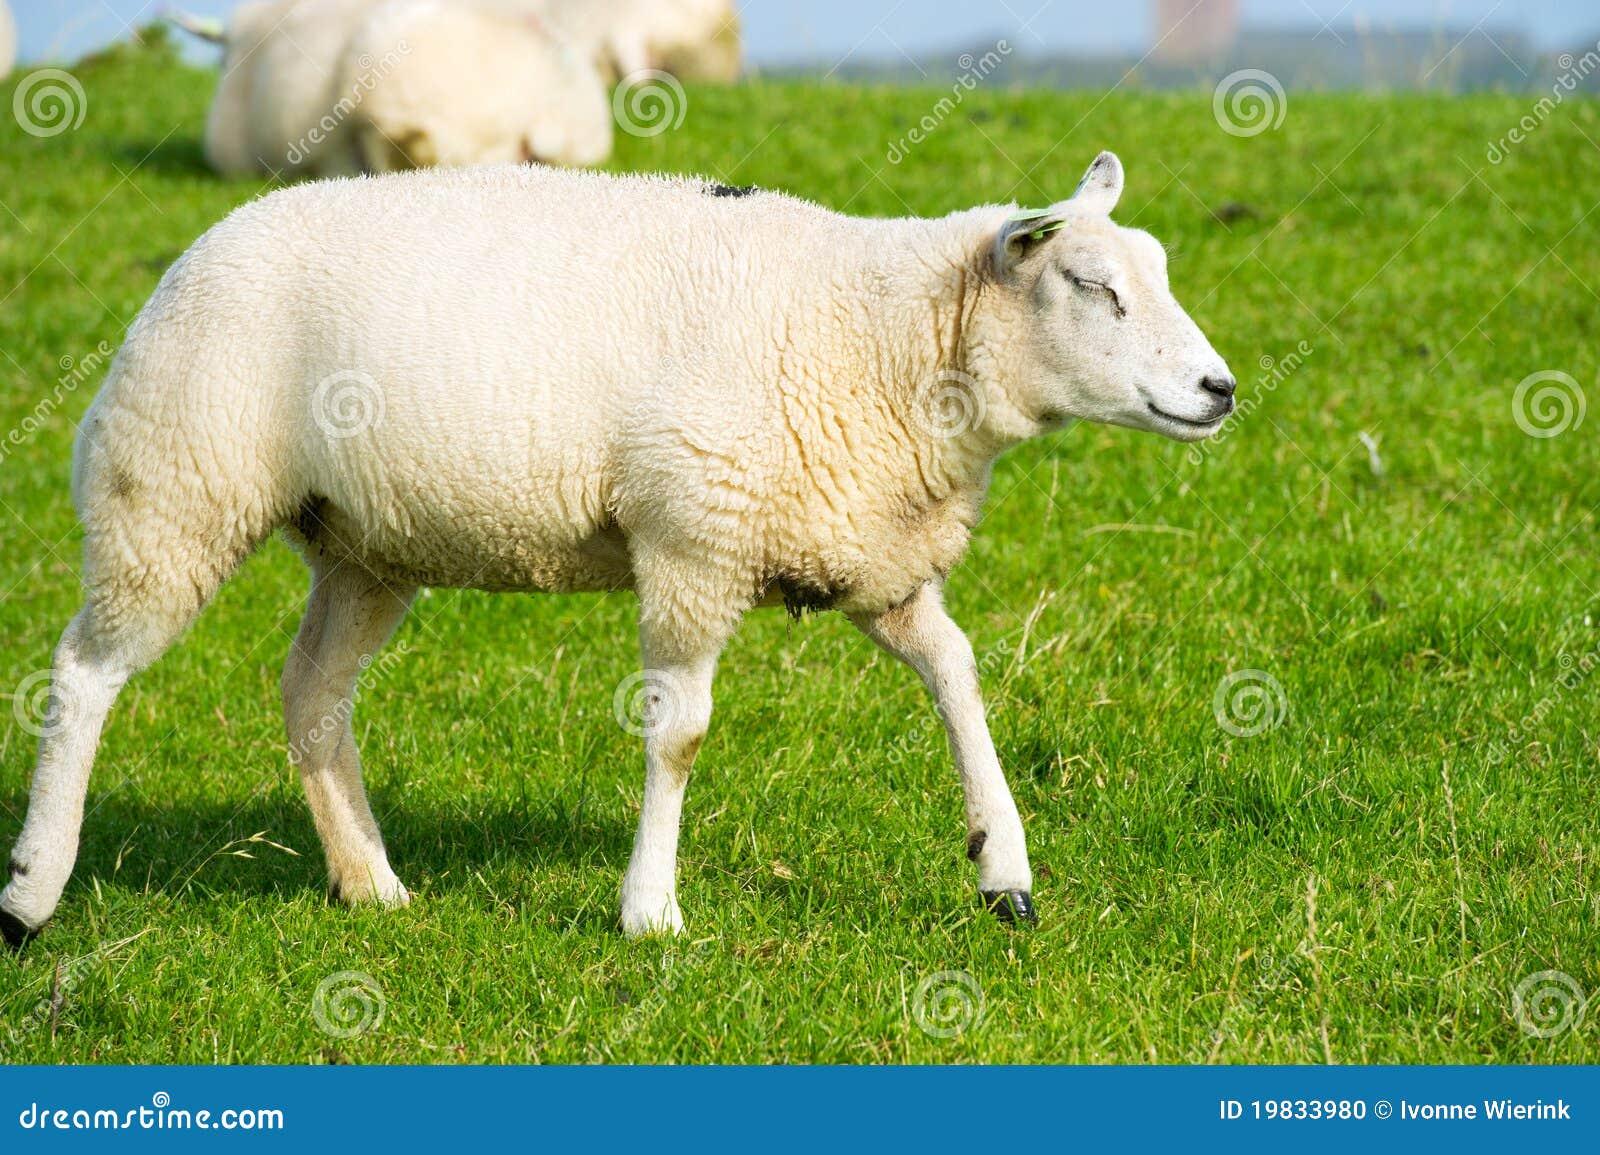 White sheep - photo#24